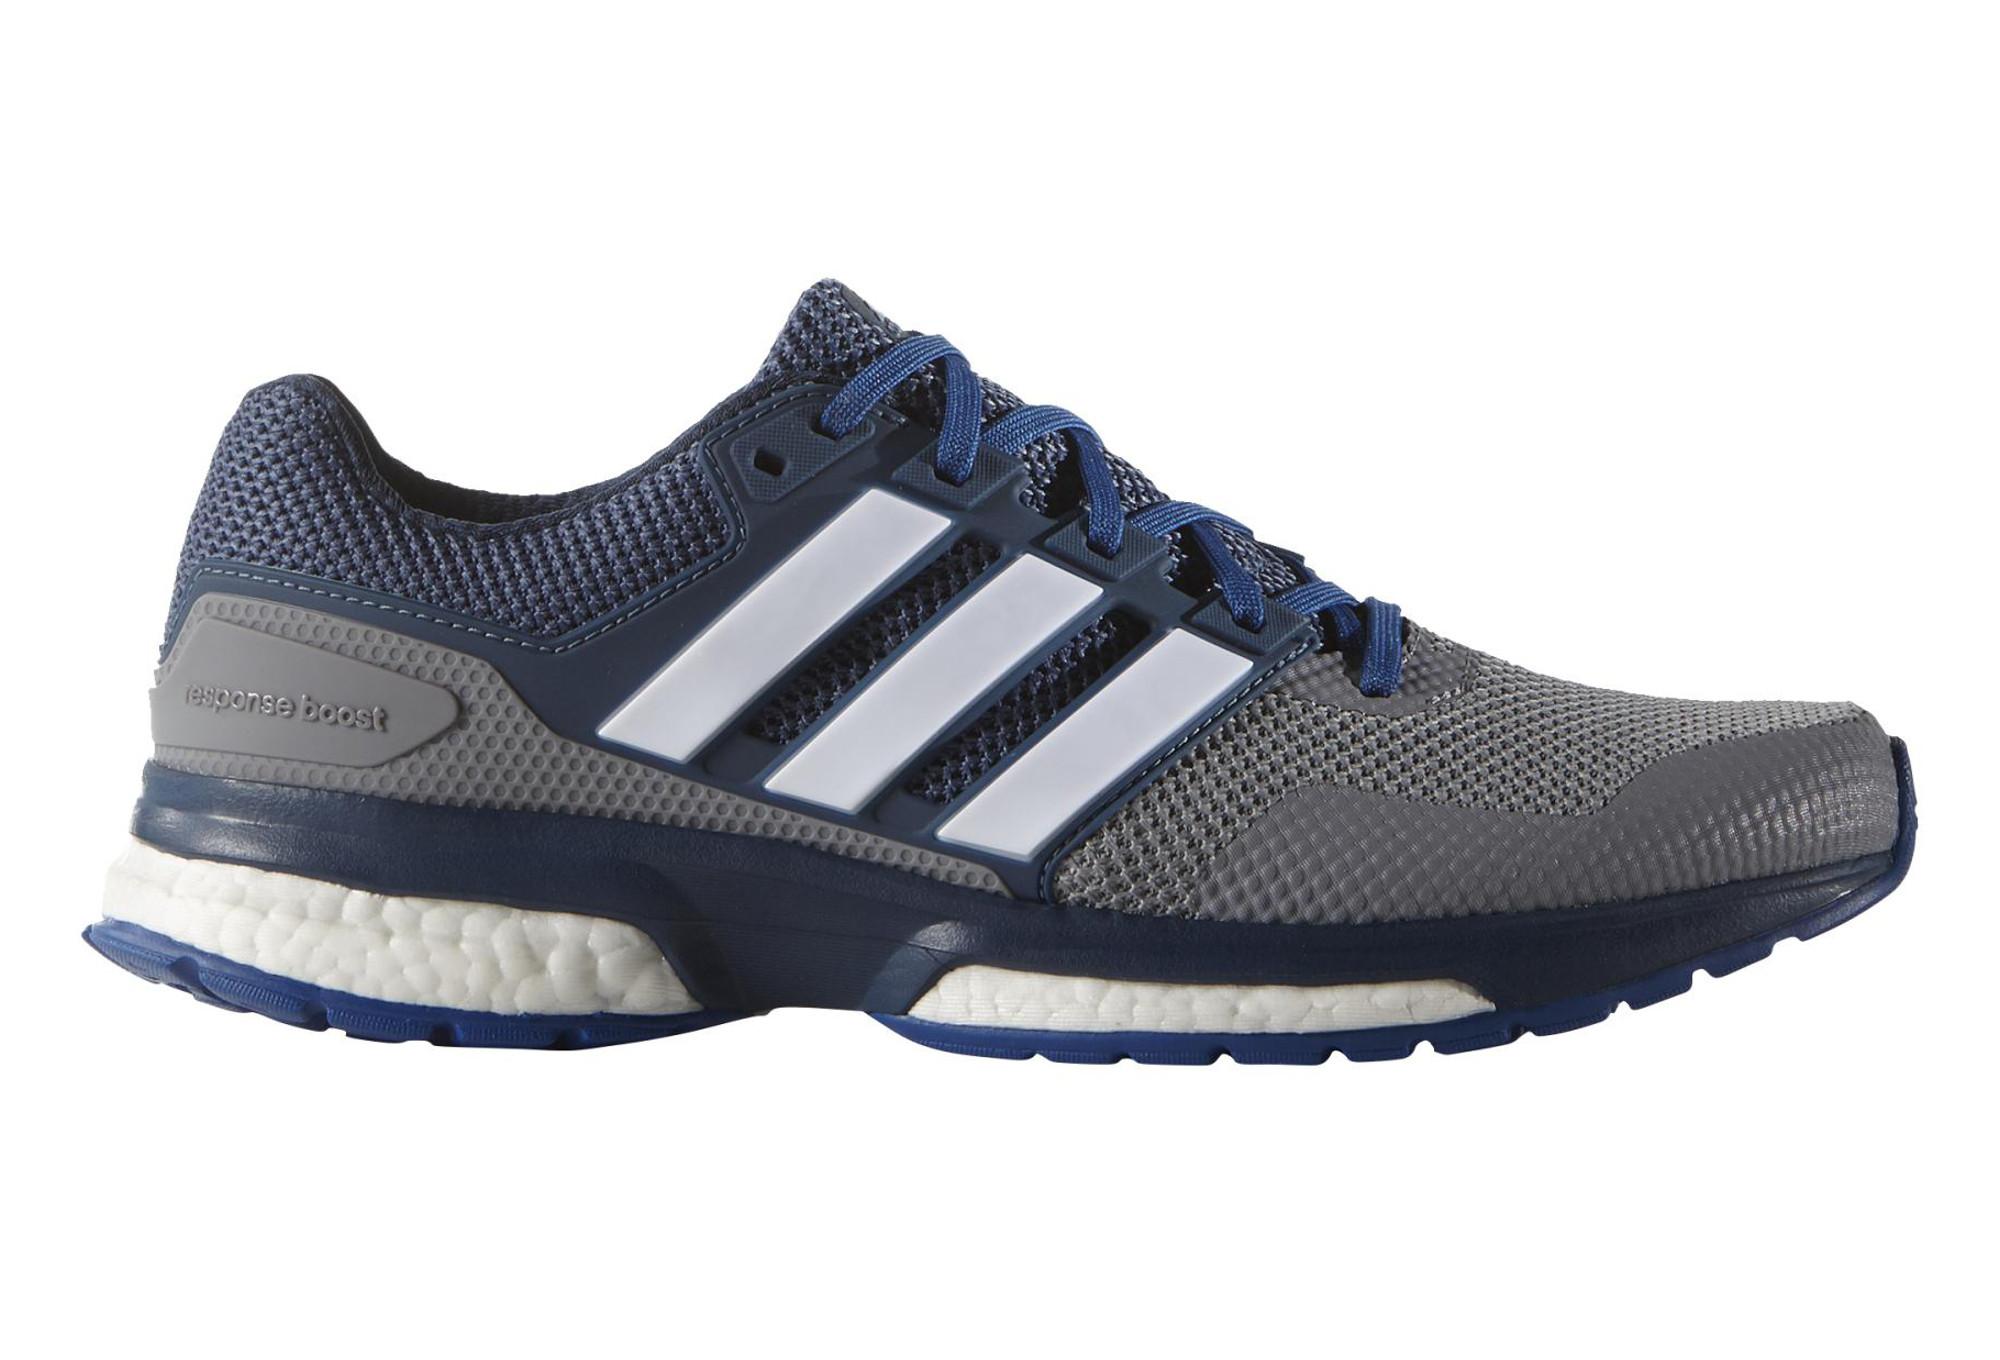 Zapatillas Running Adidas Hombre Adidas Response Boost 2